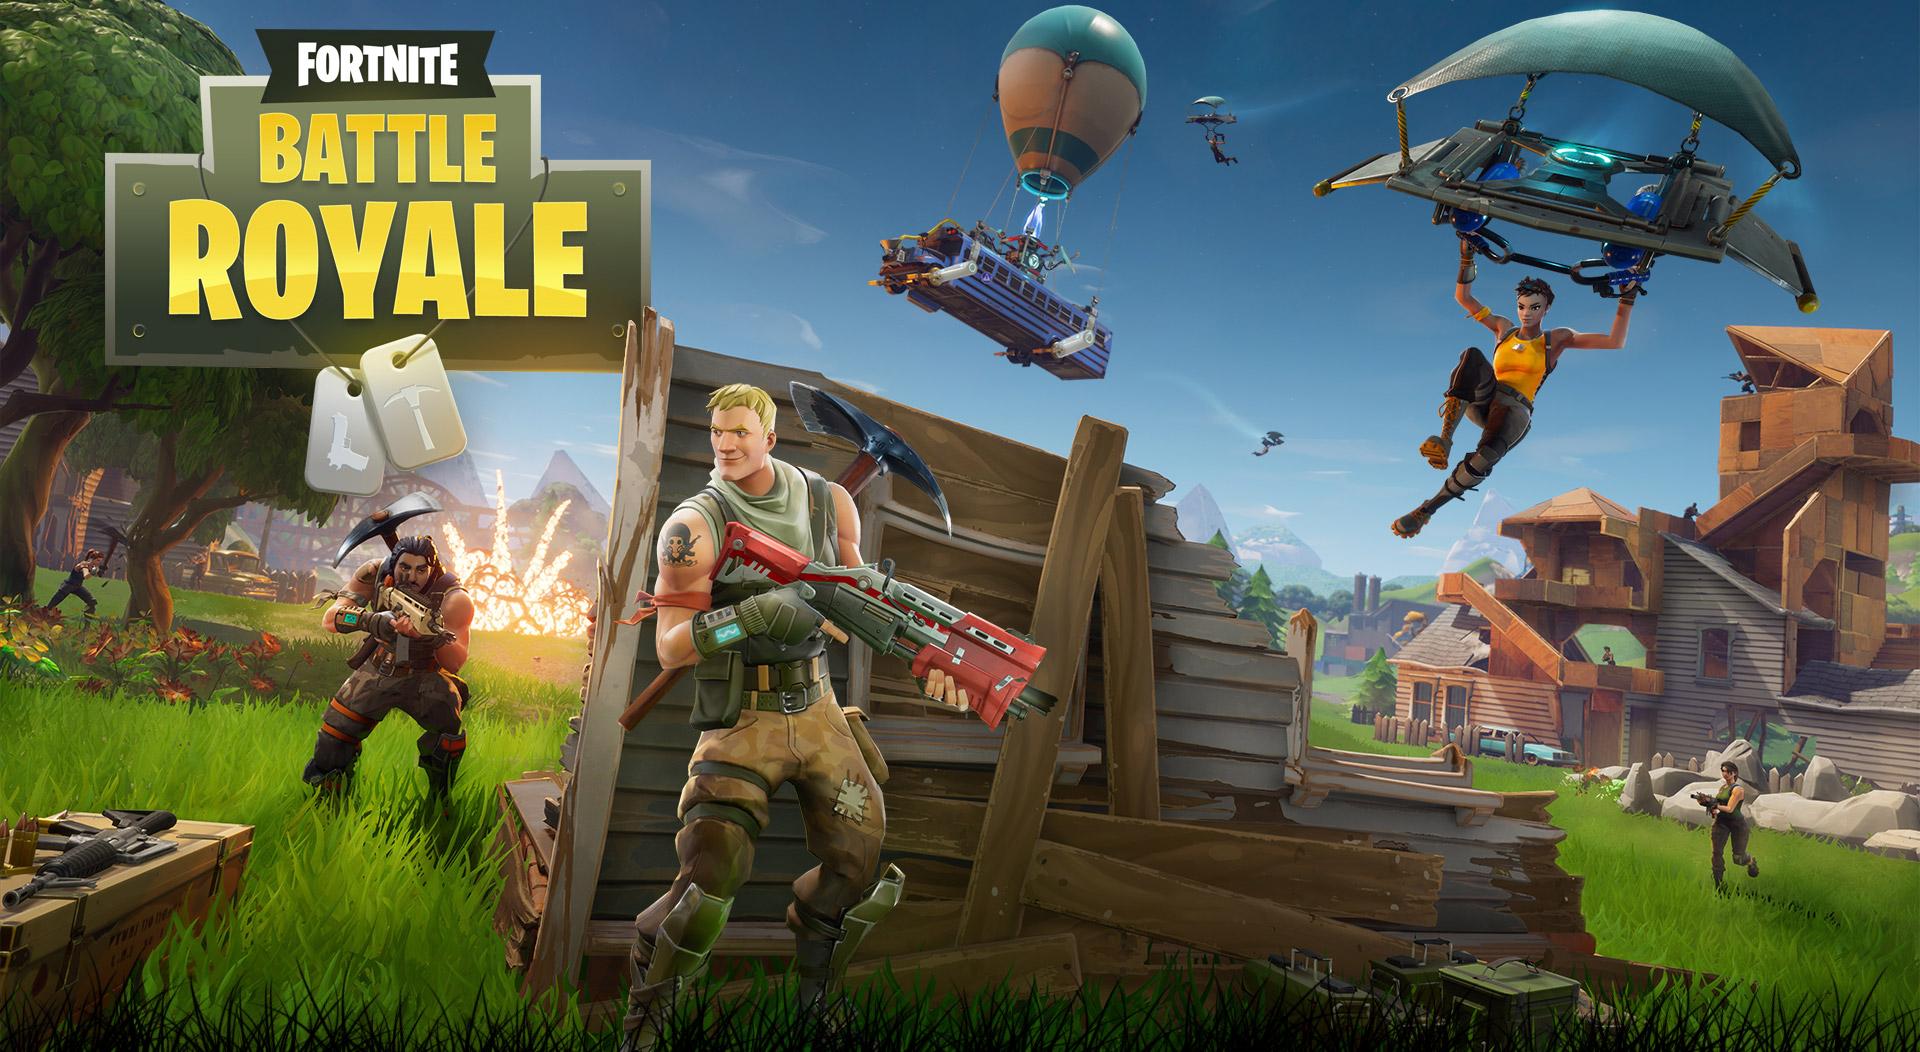 Epic Games responde a lo problemas en el servidor de Fortnite